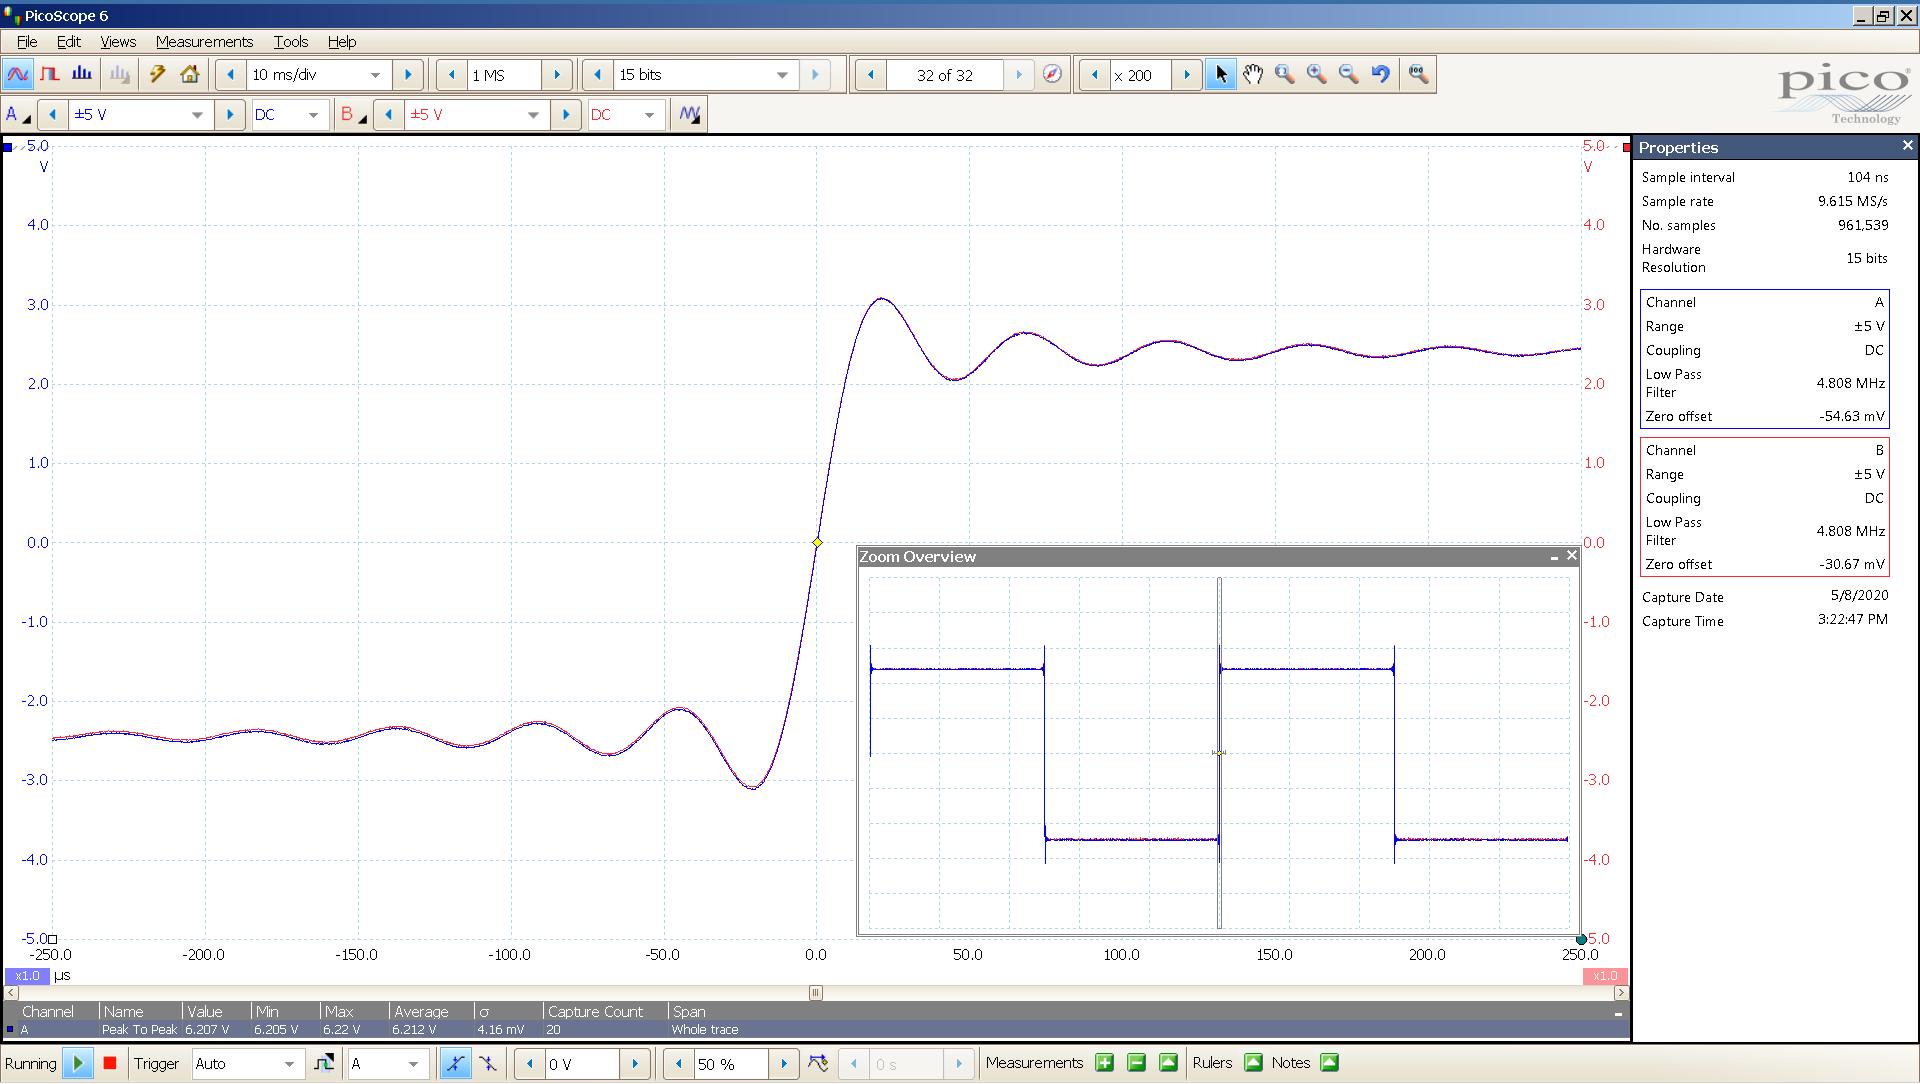 20200508-34 Matrix XSP fltr3 20 Hz sqr -2_0 dBFS 4_77 Vpp 50uS div AES SE.PNG